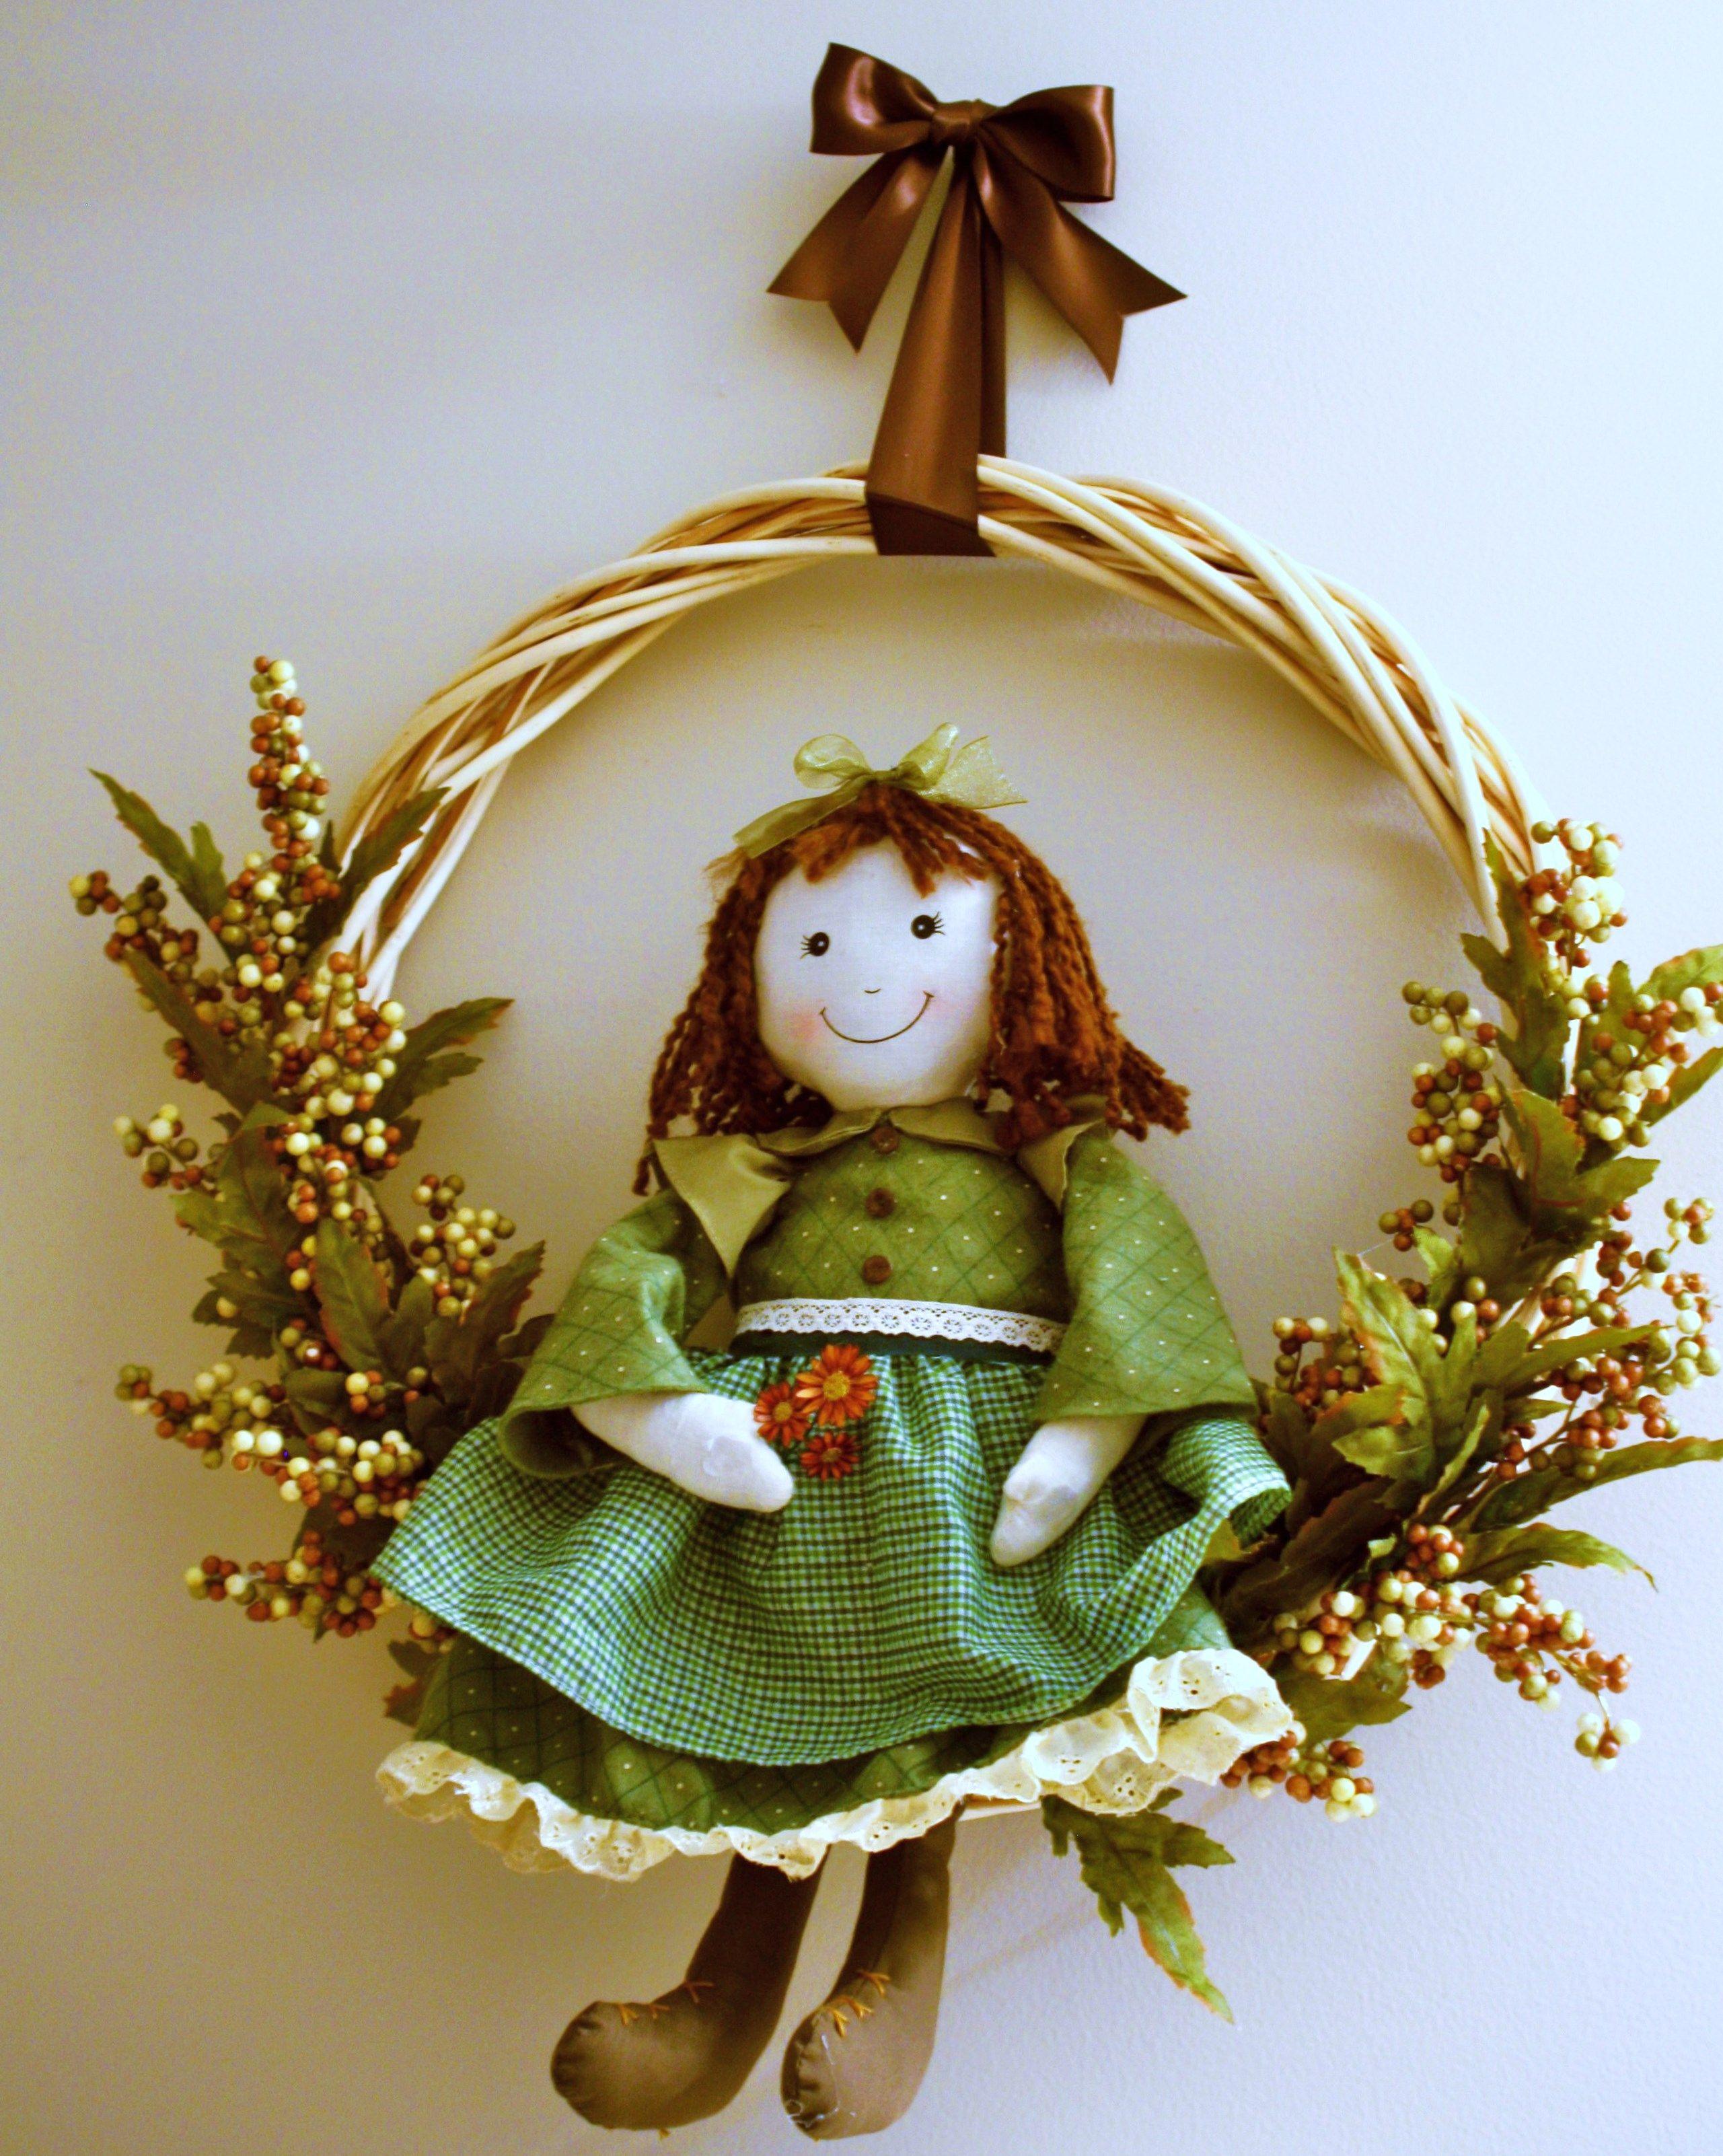 Irish girl wreath Holiday decor, Christmas ornaments